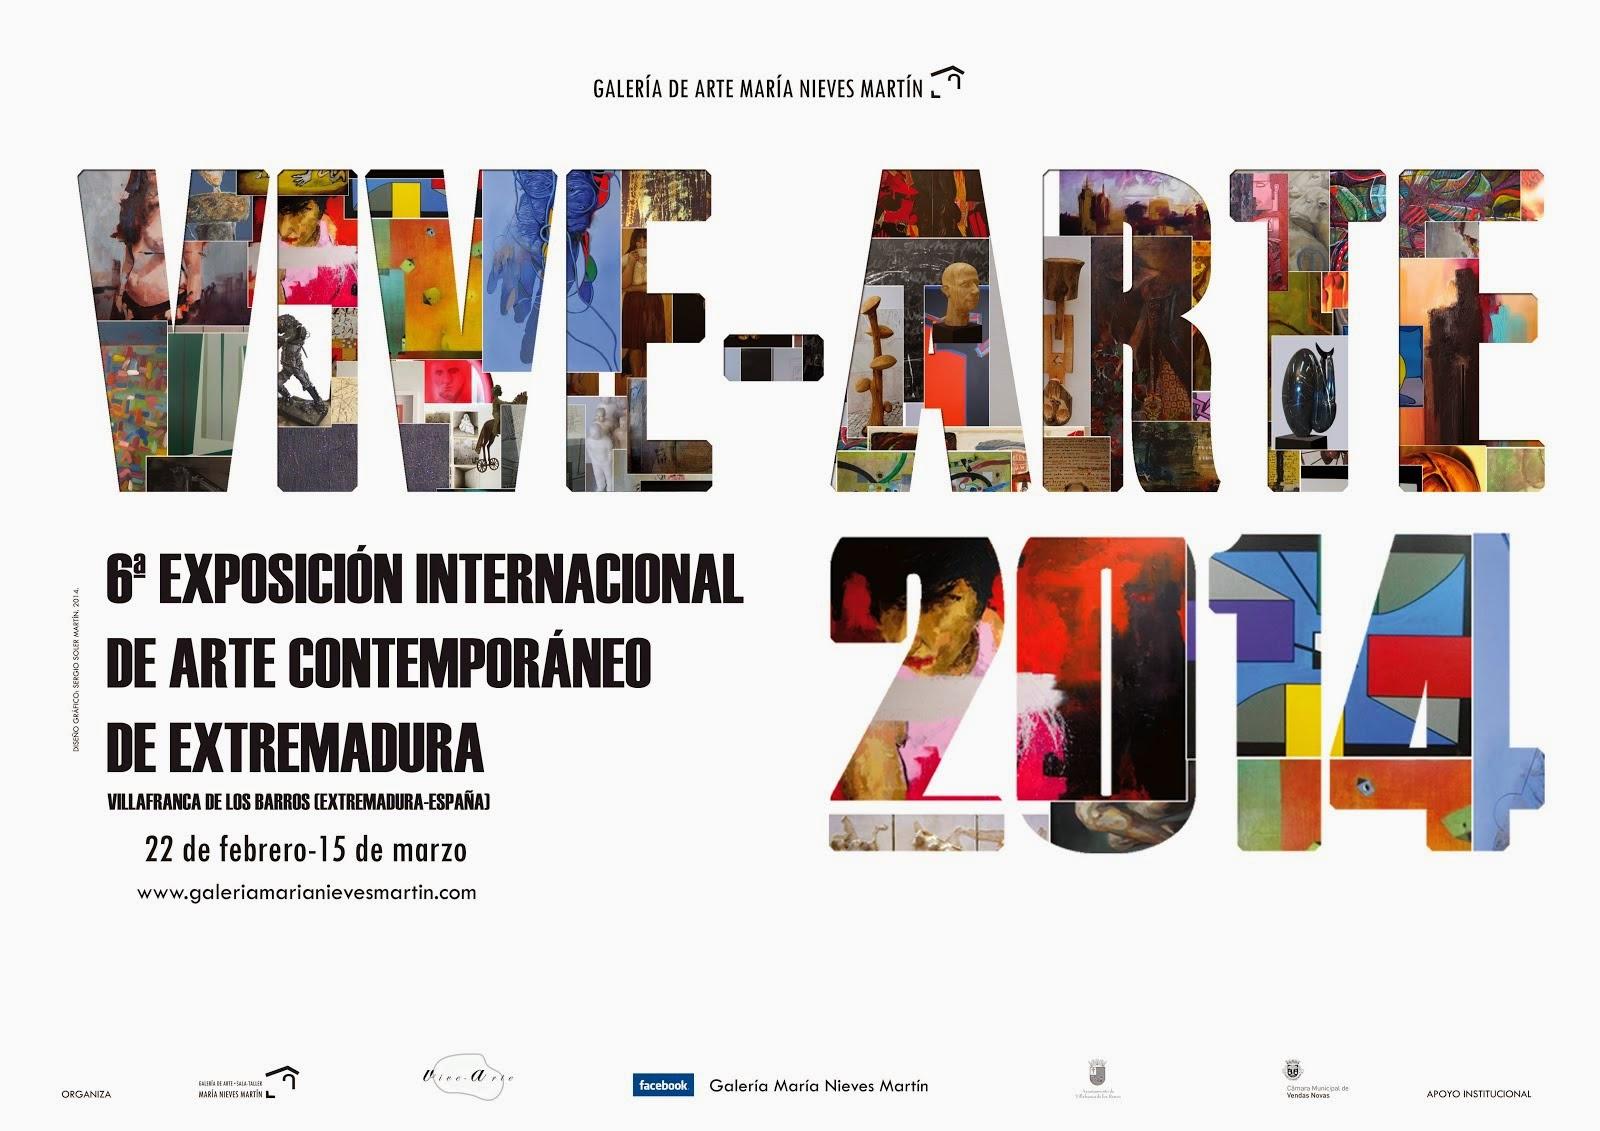 6ª Exposición Internacional de Arte Contemporáneo de Extremadura VIVE-ARTE 2014